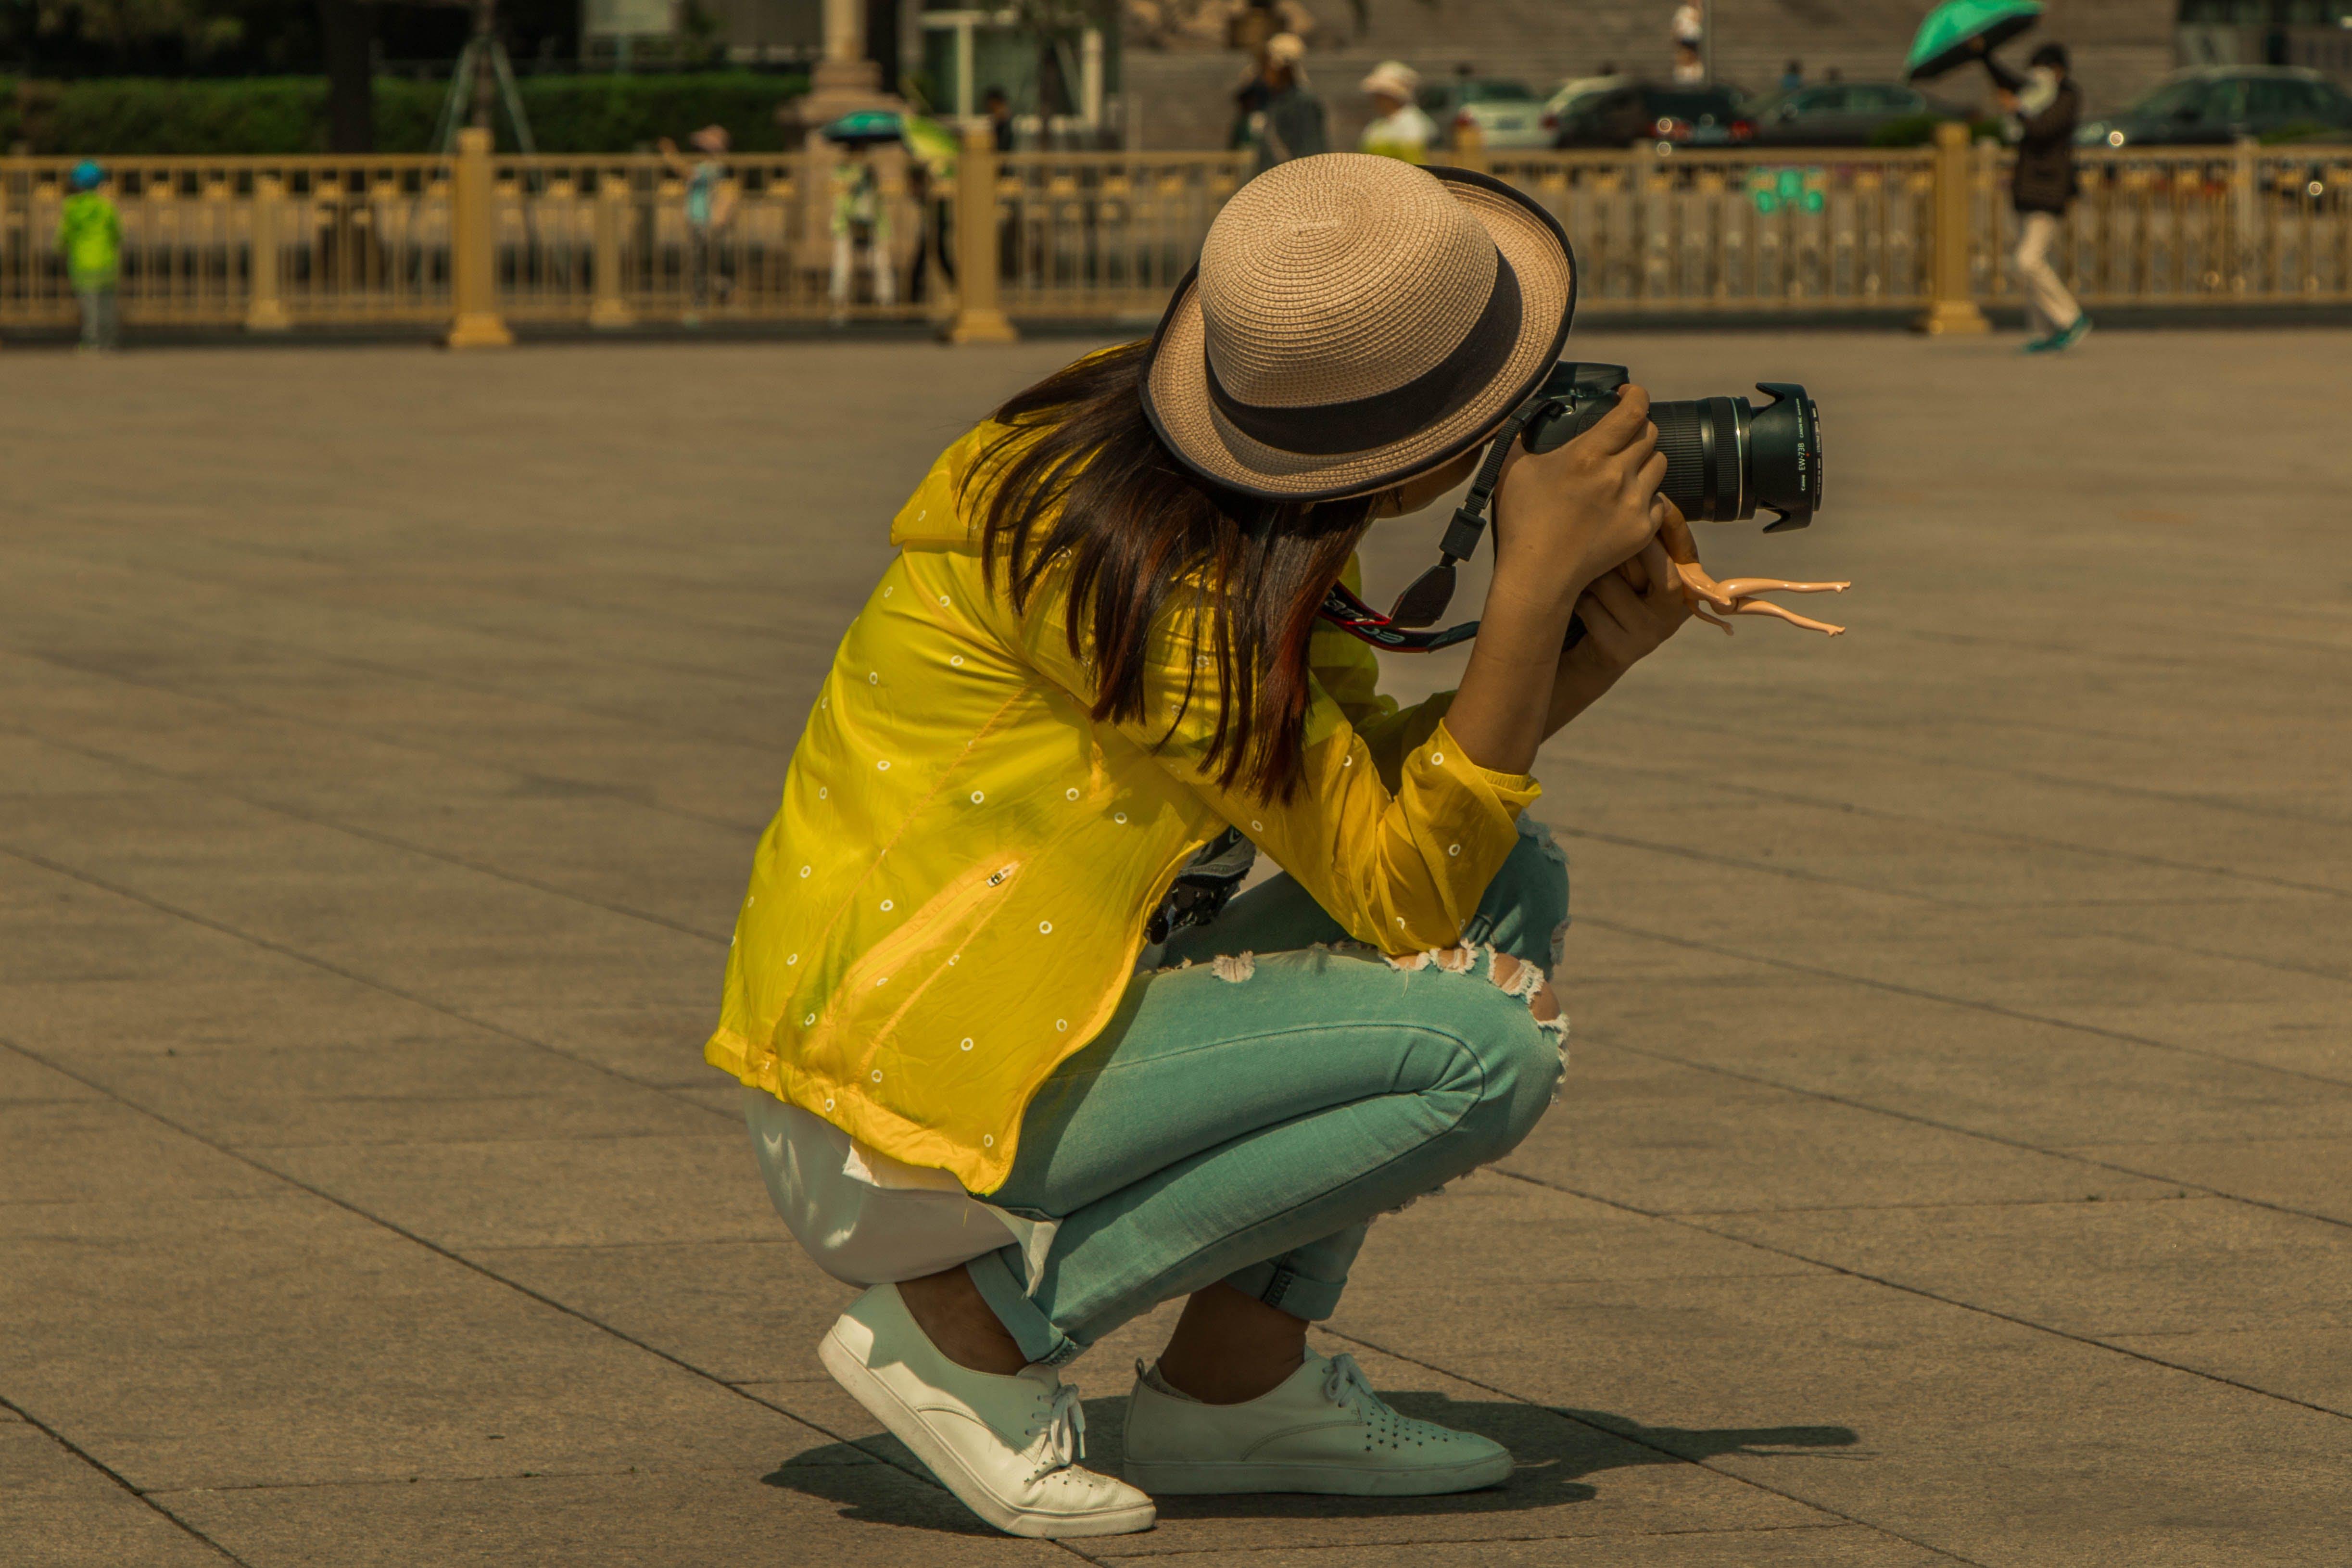 Asian, camera, camera lens